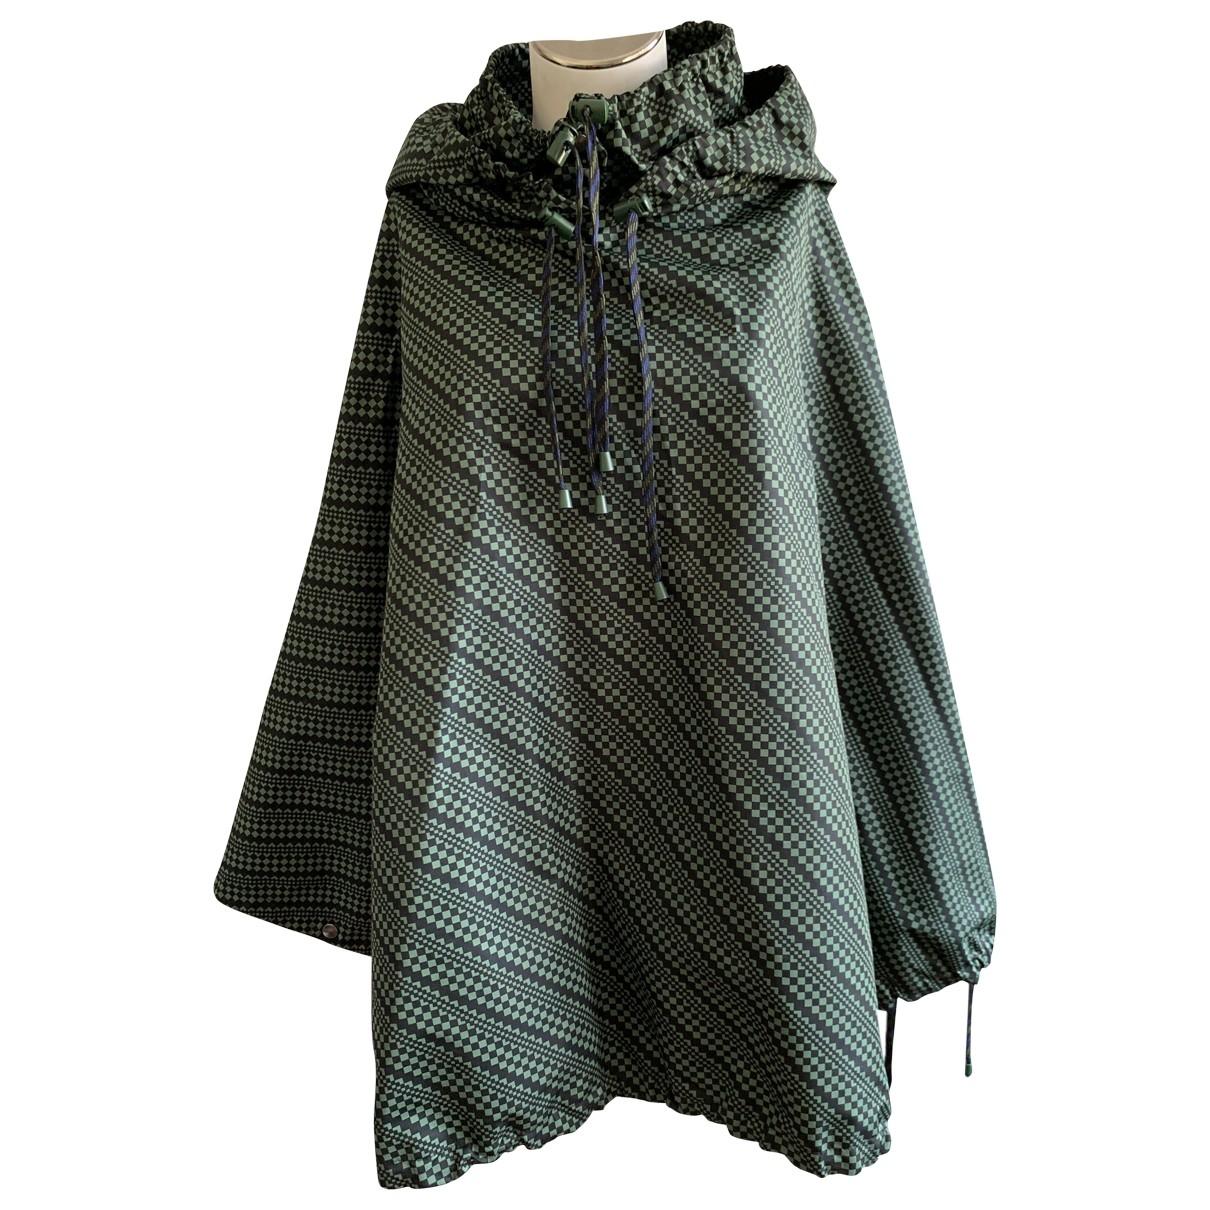 Maurice Lacroix \N Green jacket for Women M International